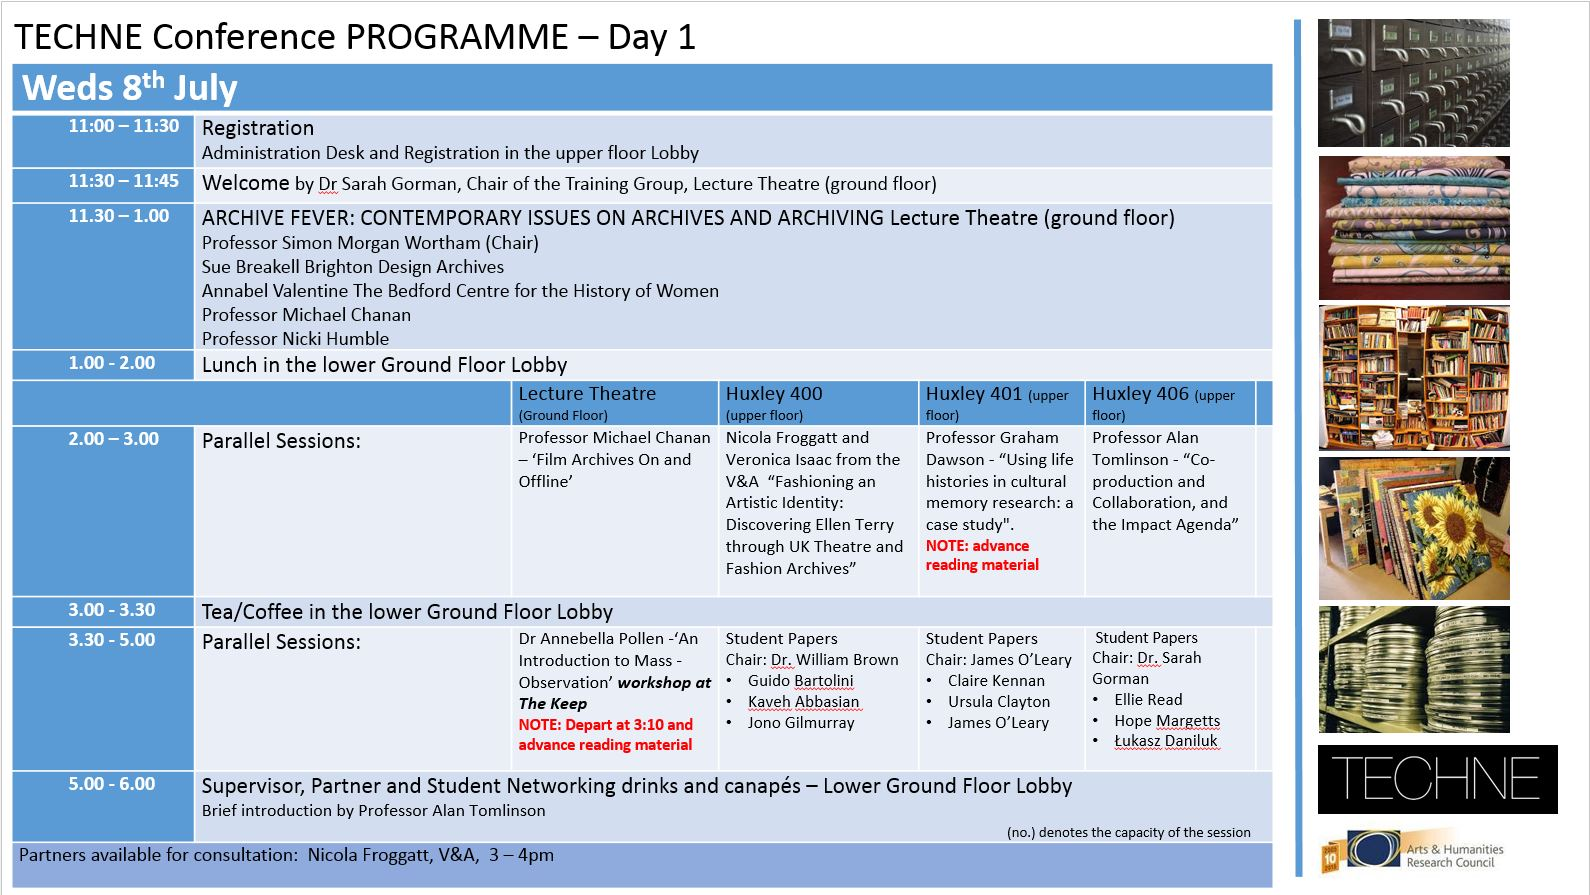 TECHNE-Congress-July-2015-Day-1-Programme